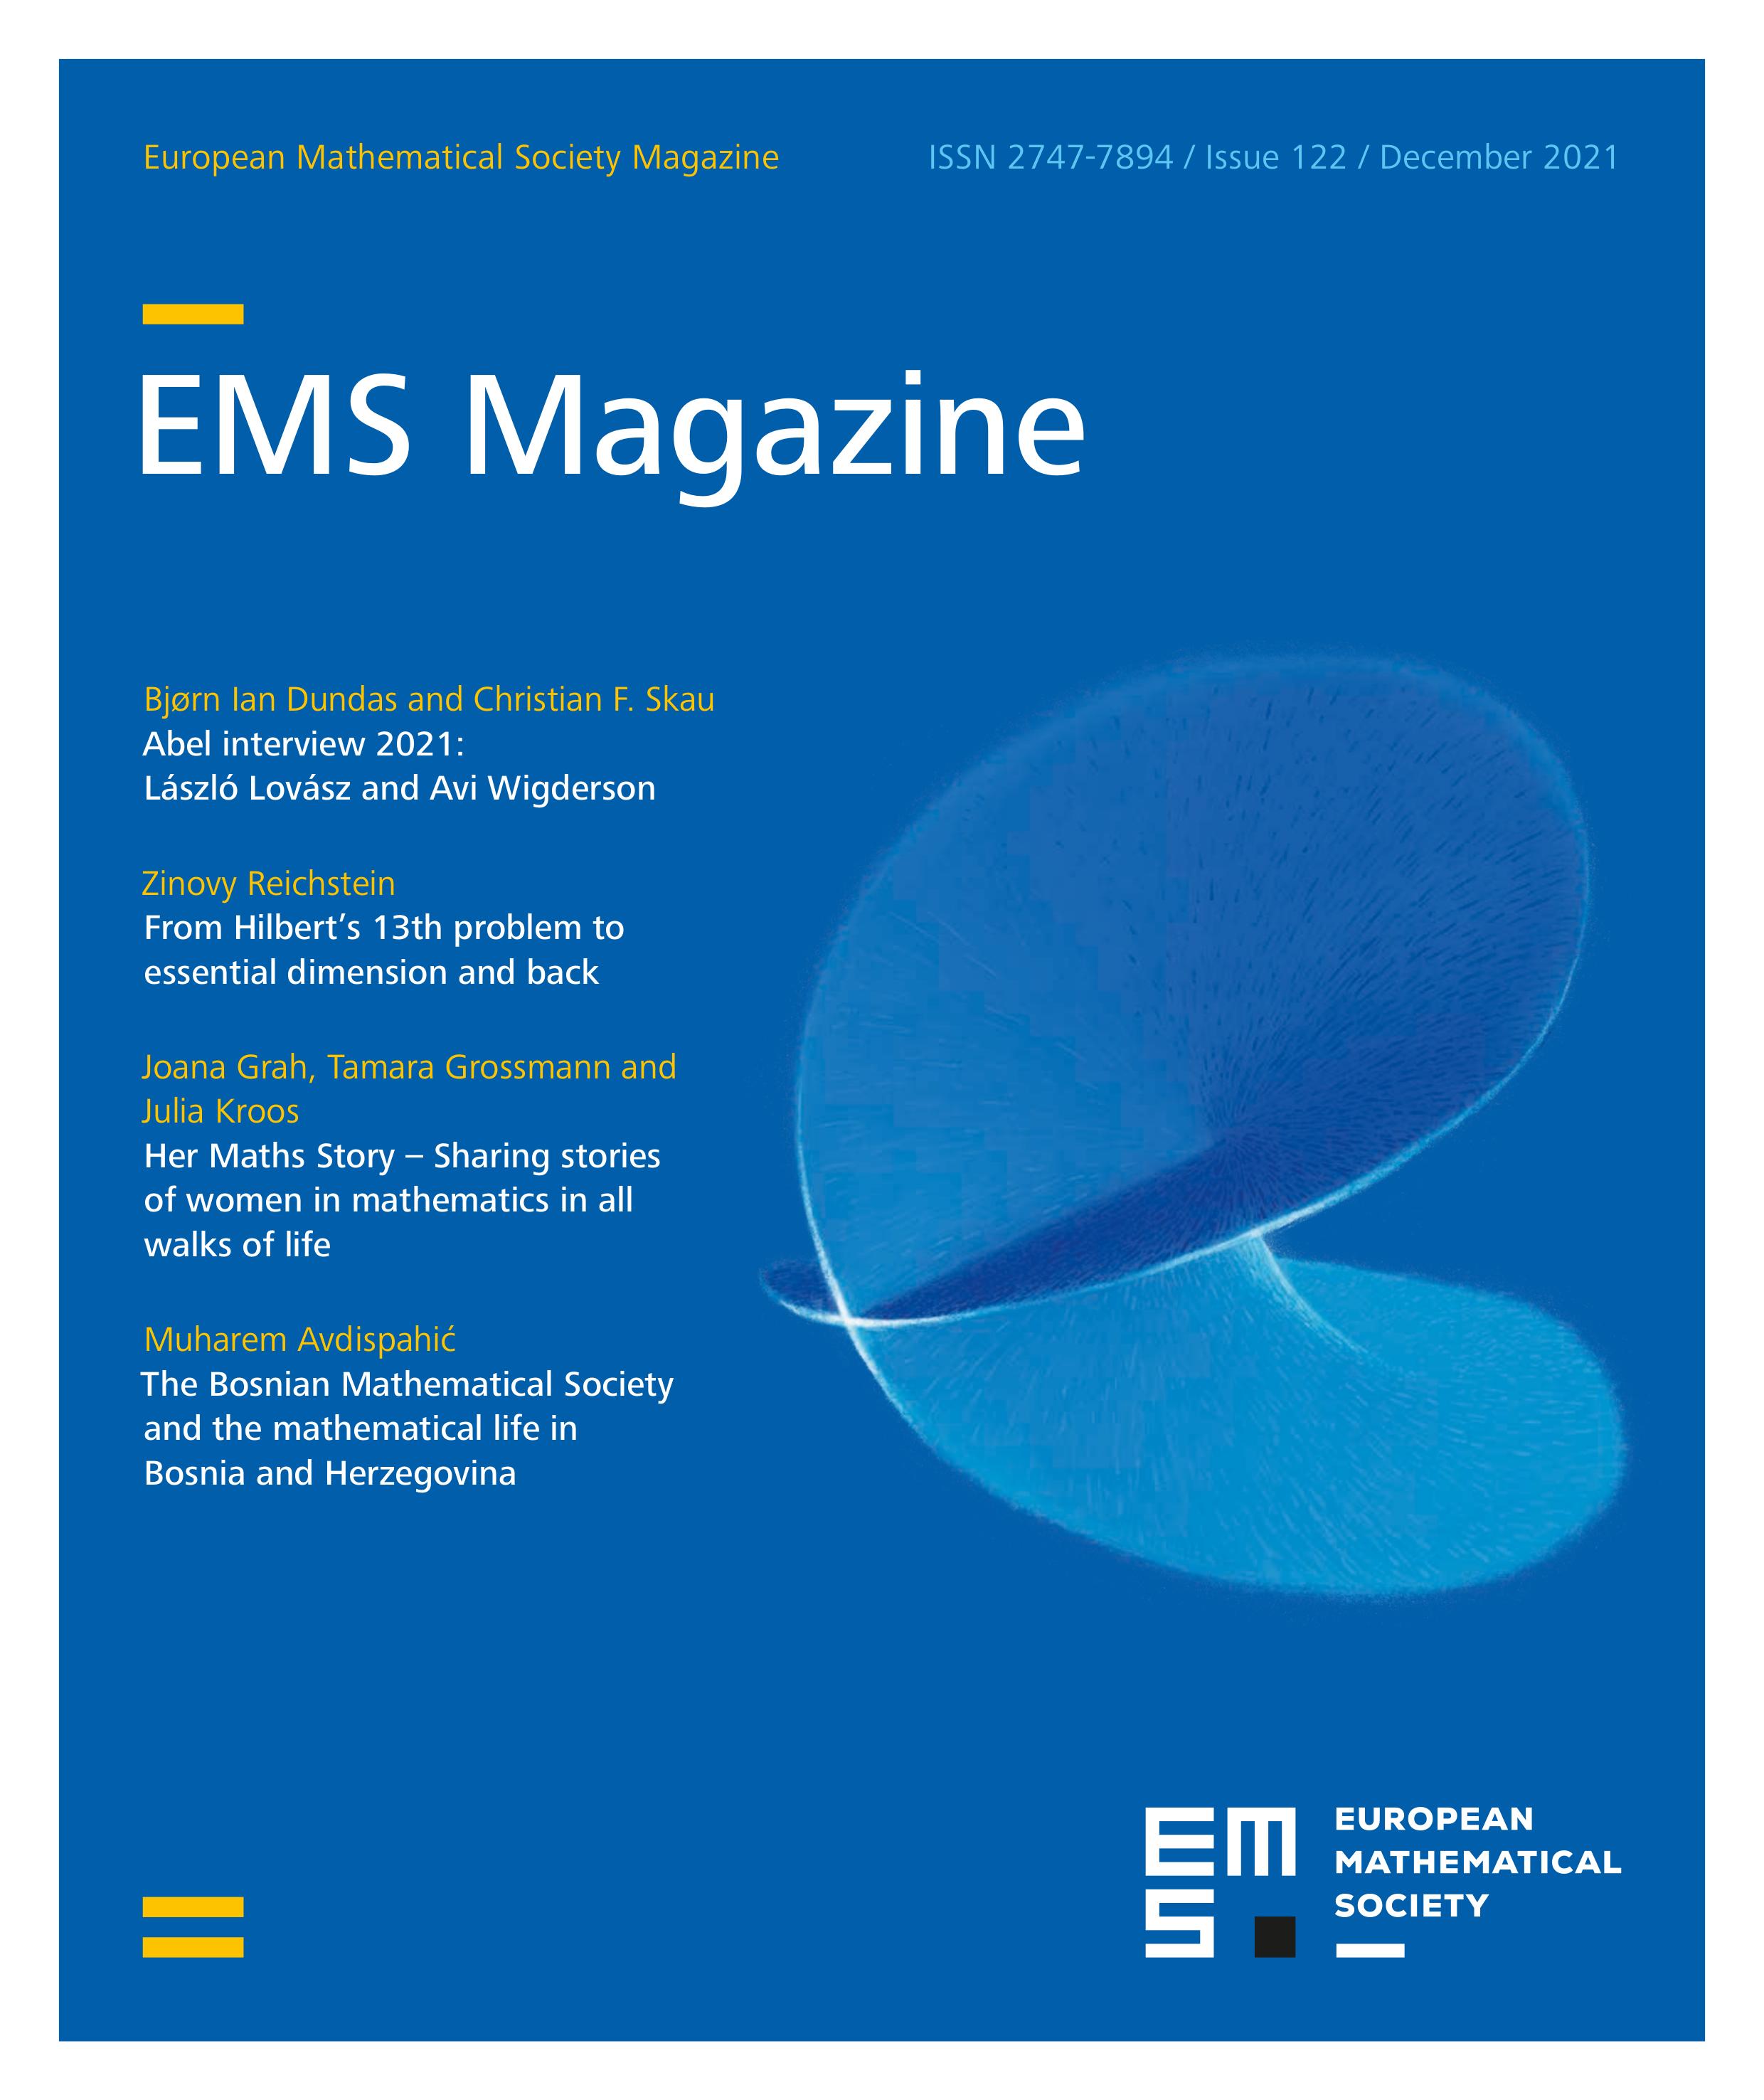 Mag. Eur. Math. Soc. cover